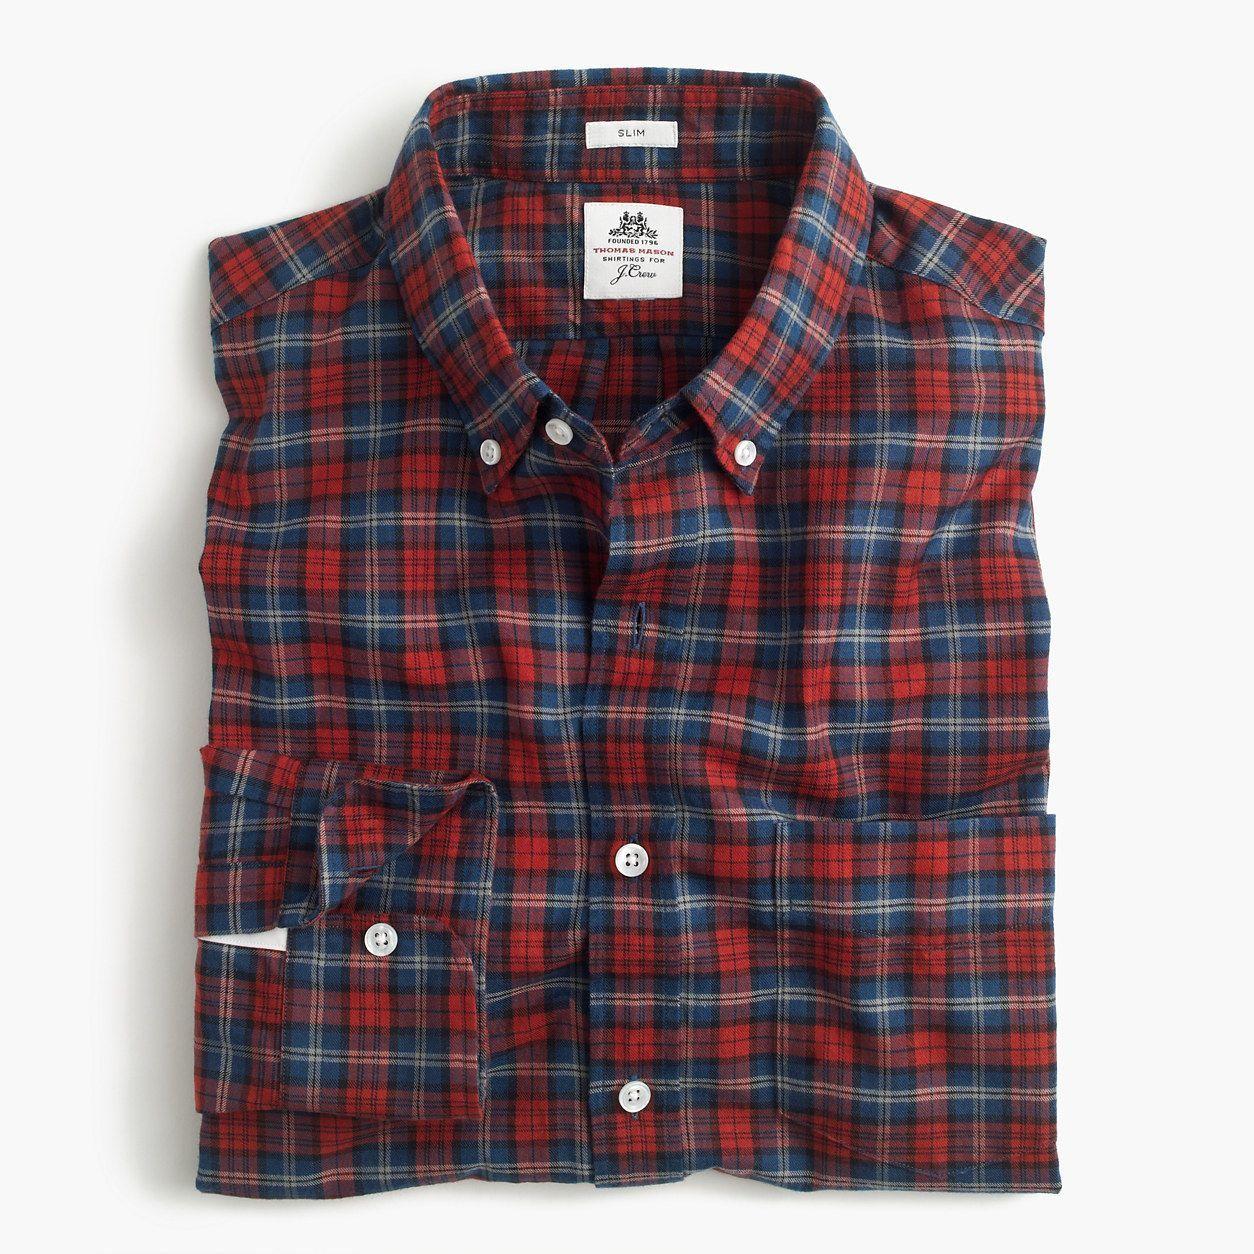 709770f6324c72 Slim Thomas Mason For J.Crew Flannel Shirt In Red Plaid (Size S ...